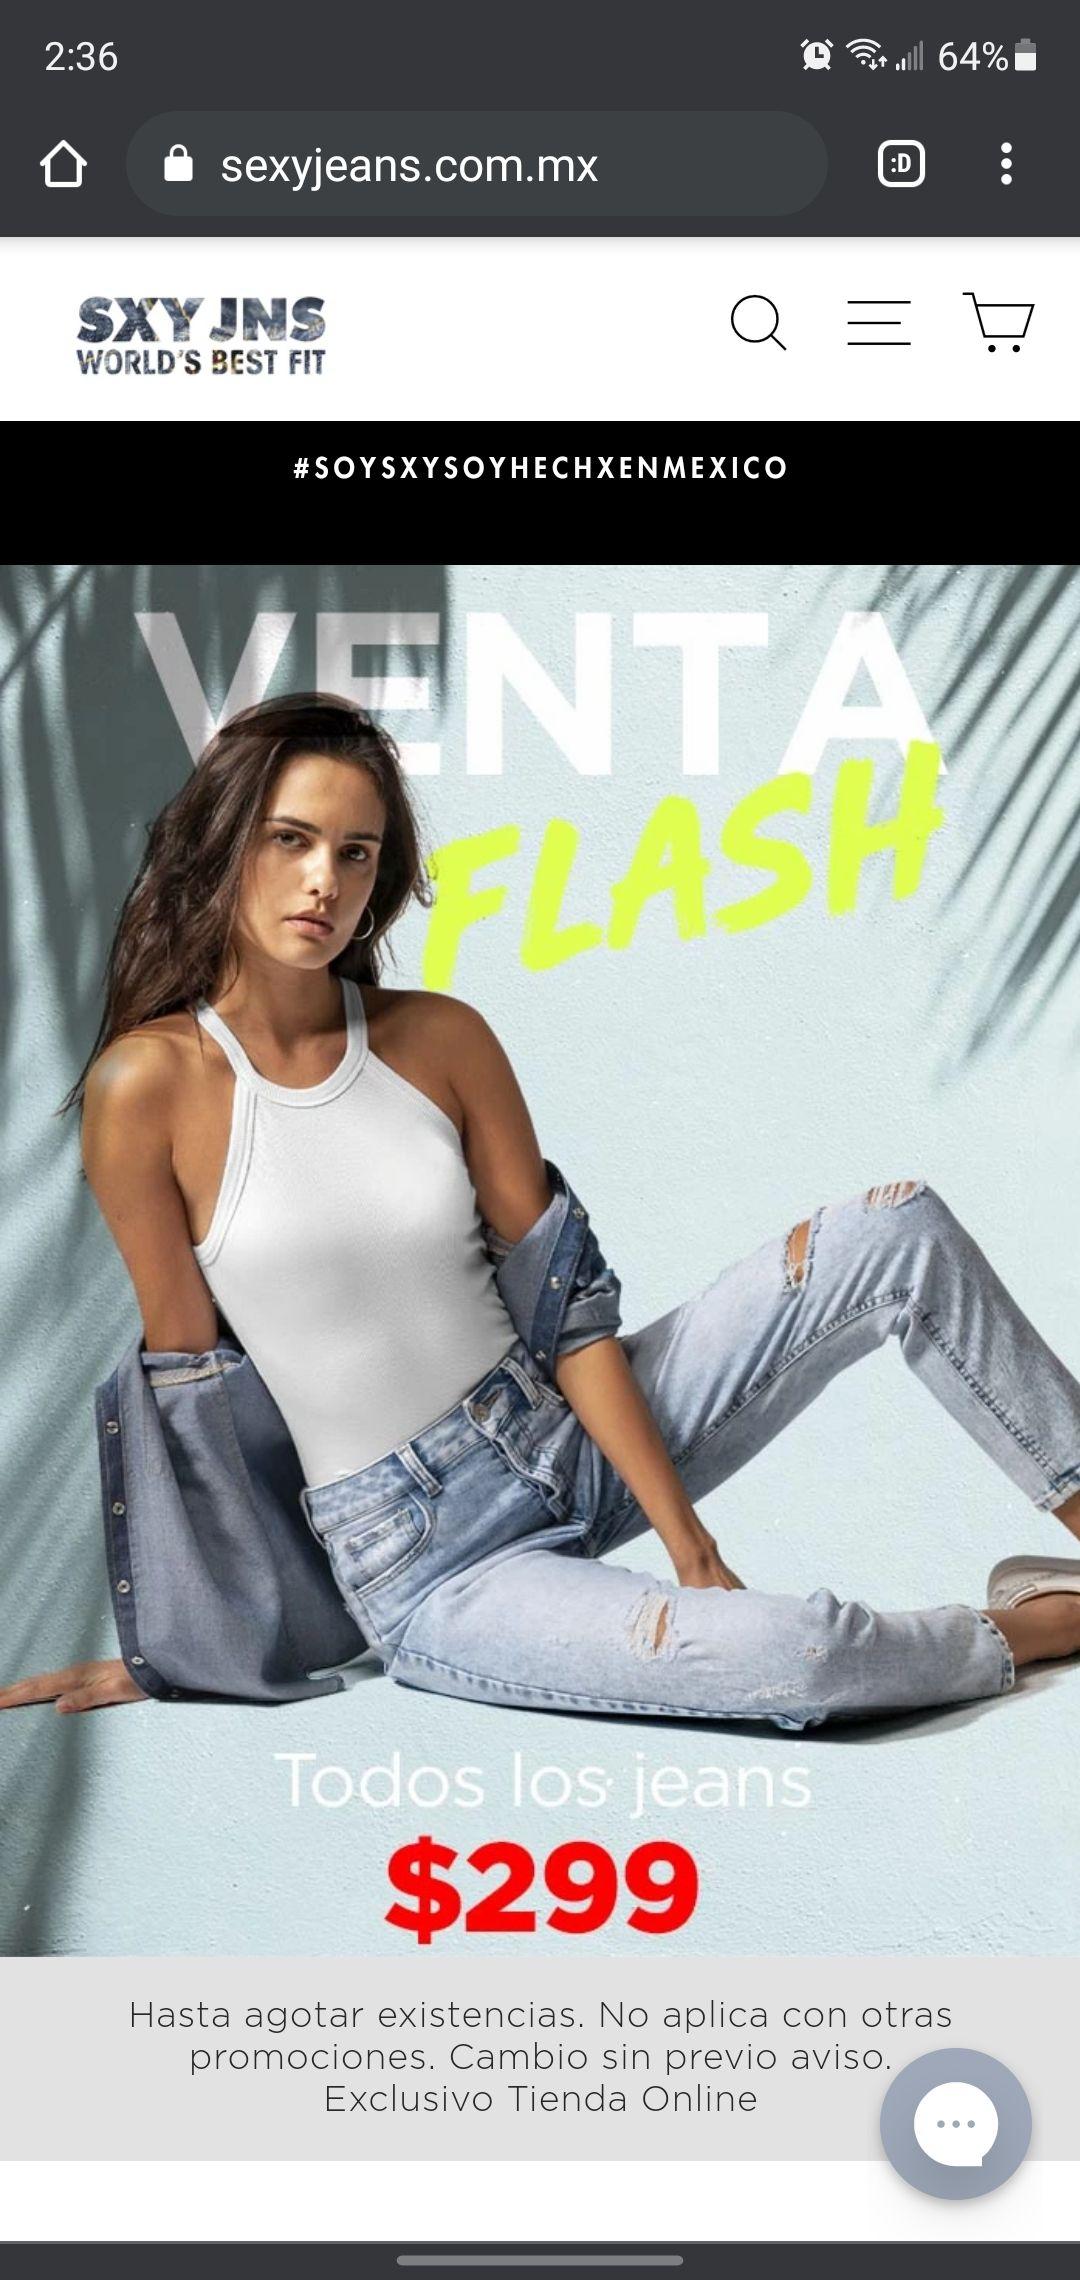 Pantalones Sexy Jeans $299